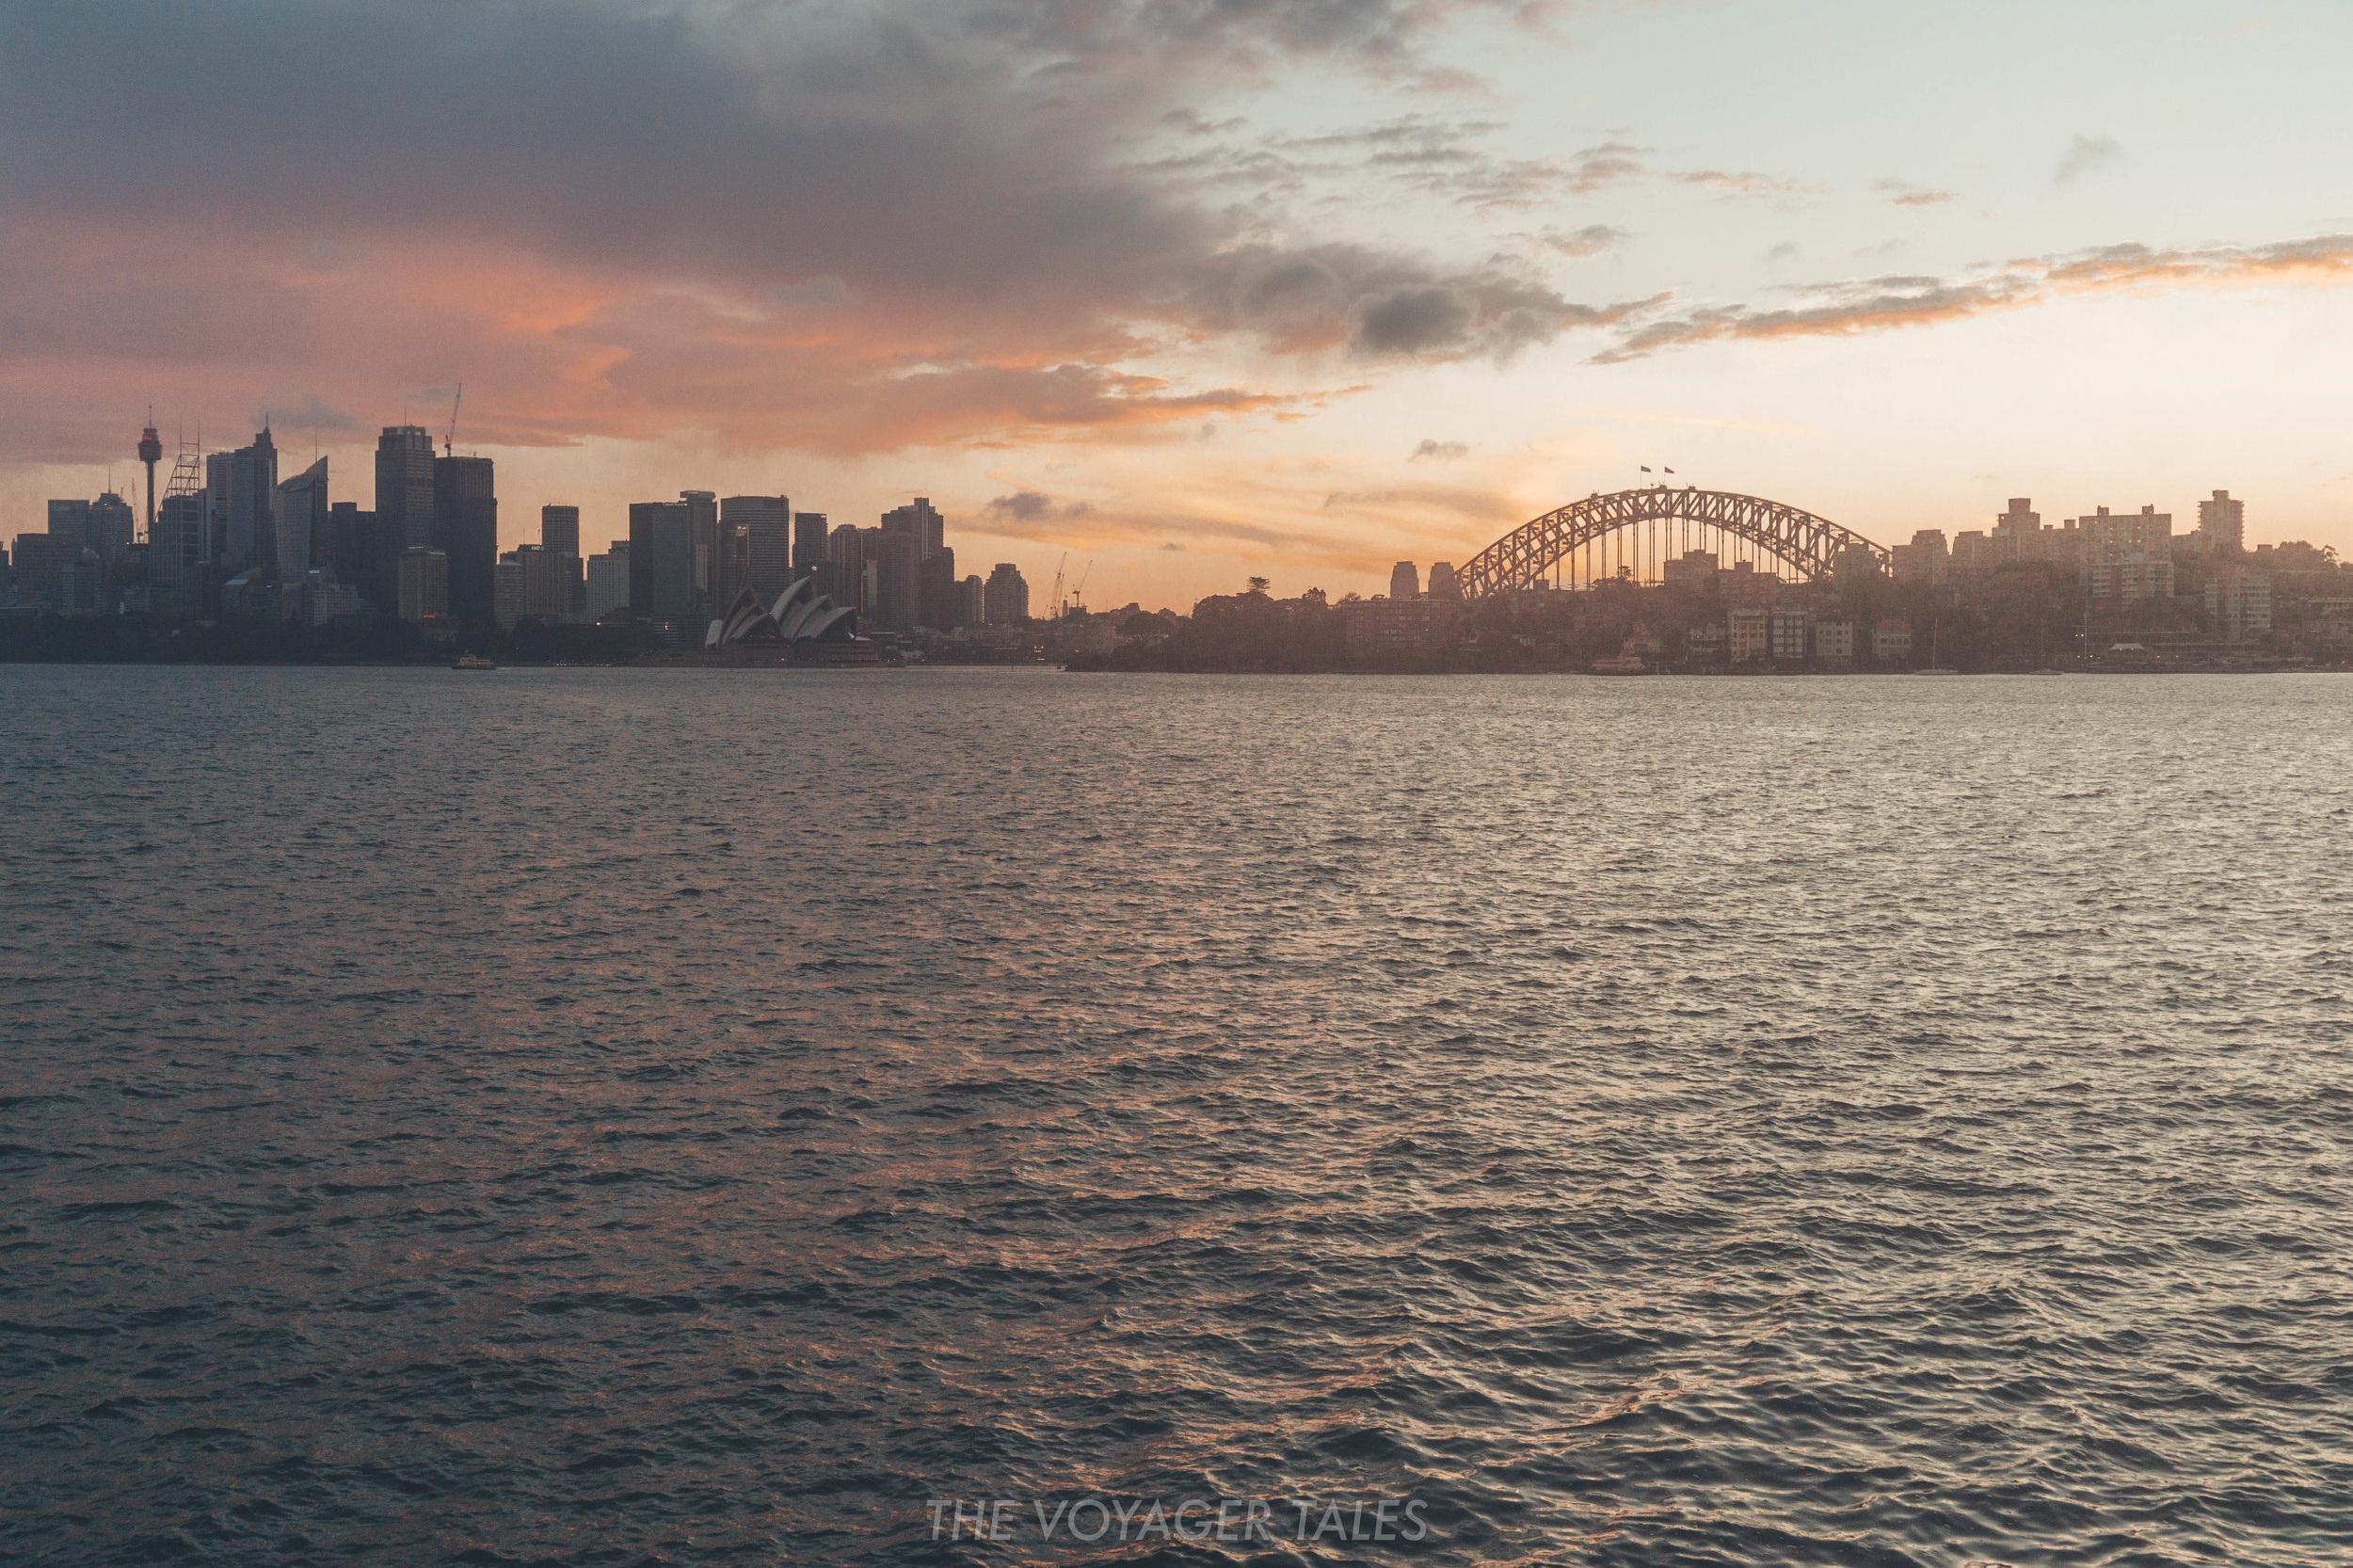 Australia landing page image